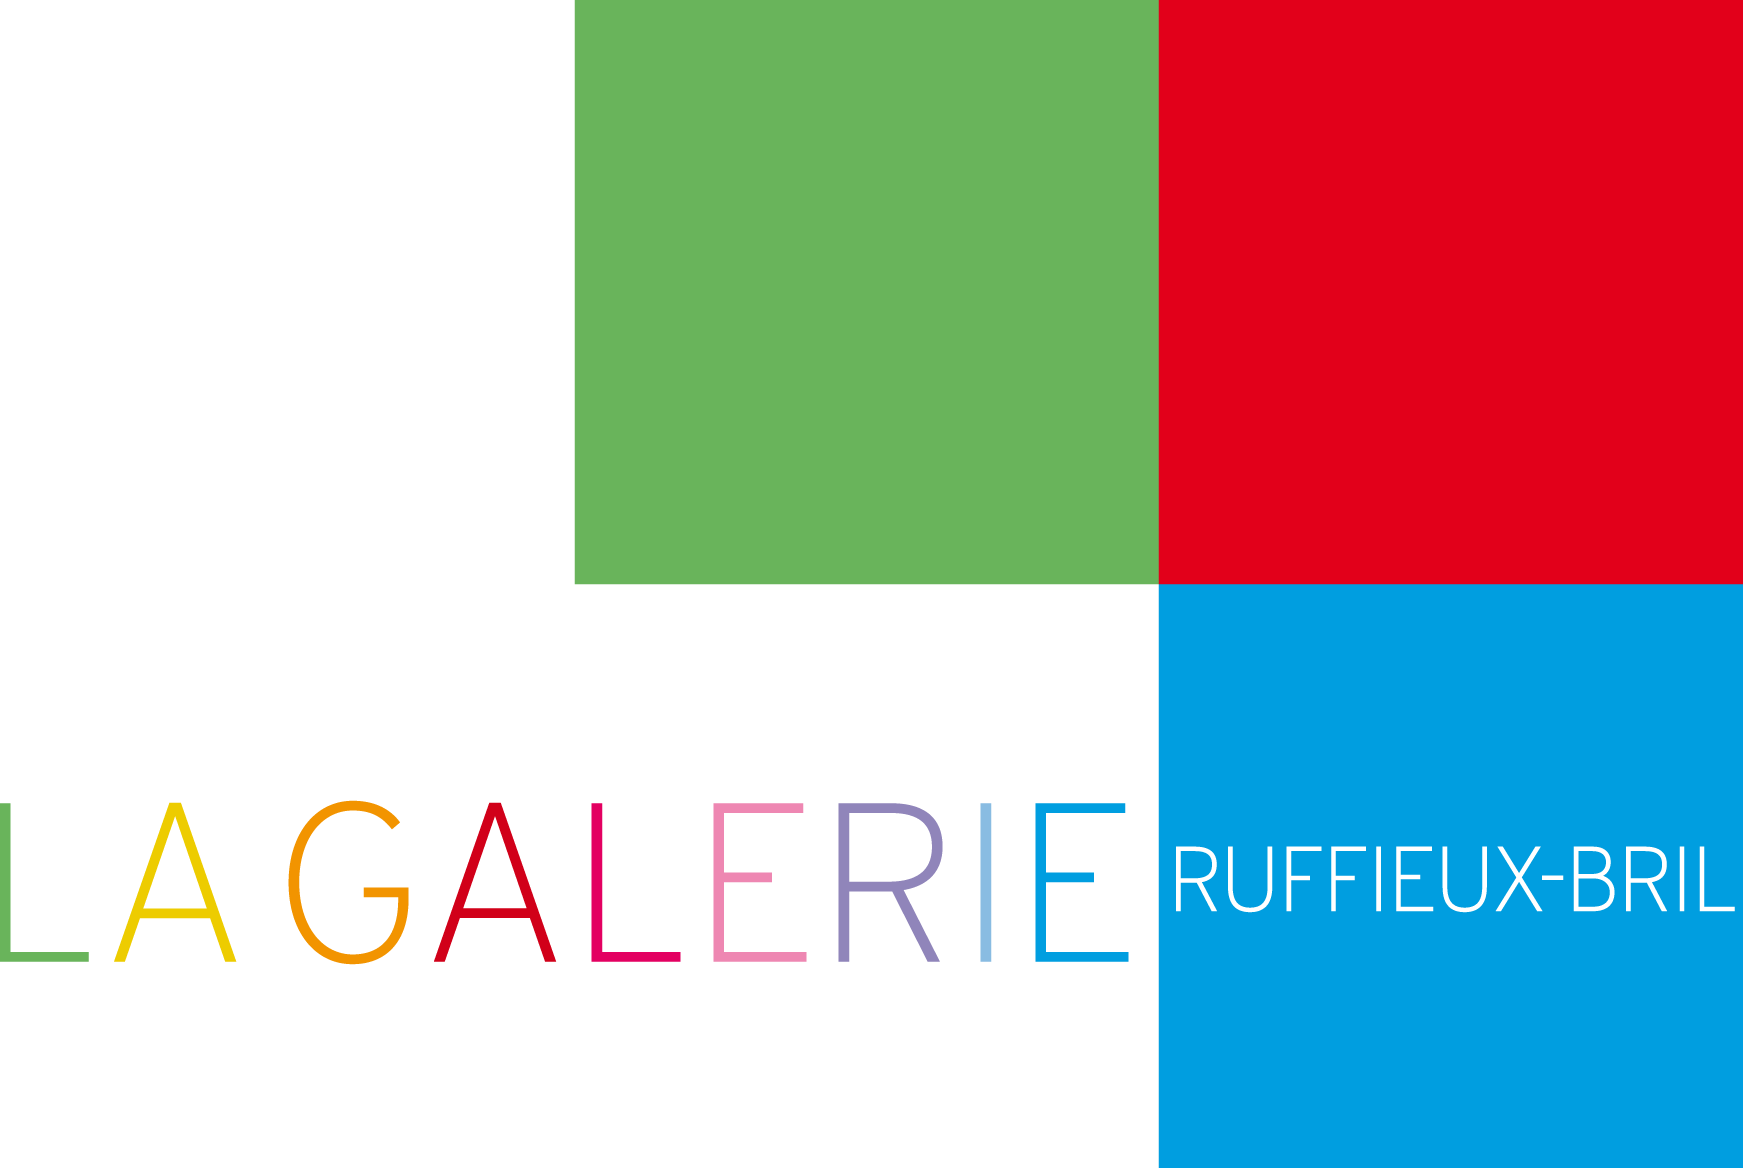 Galerie Ruffieux Bril